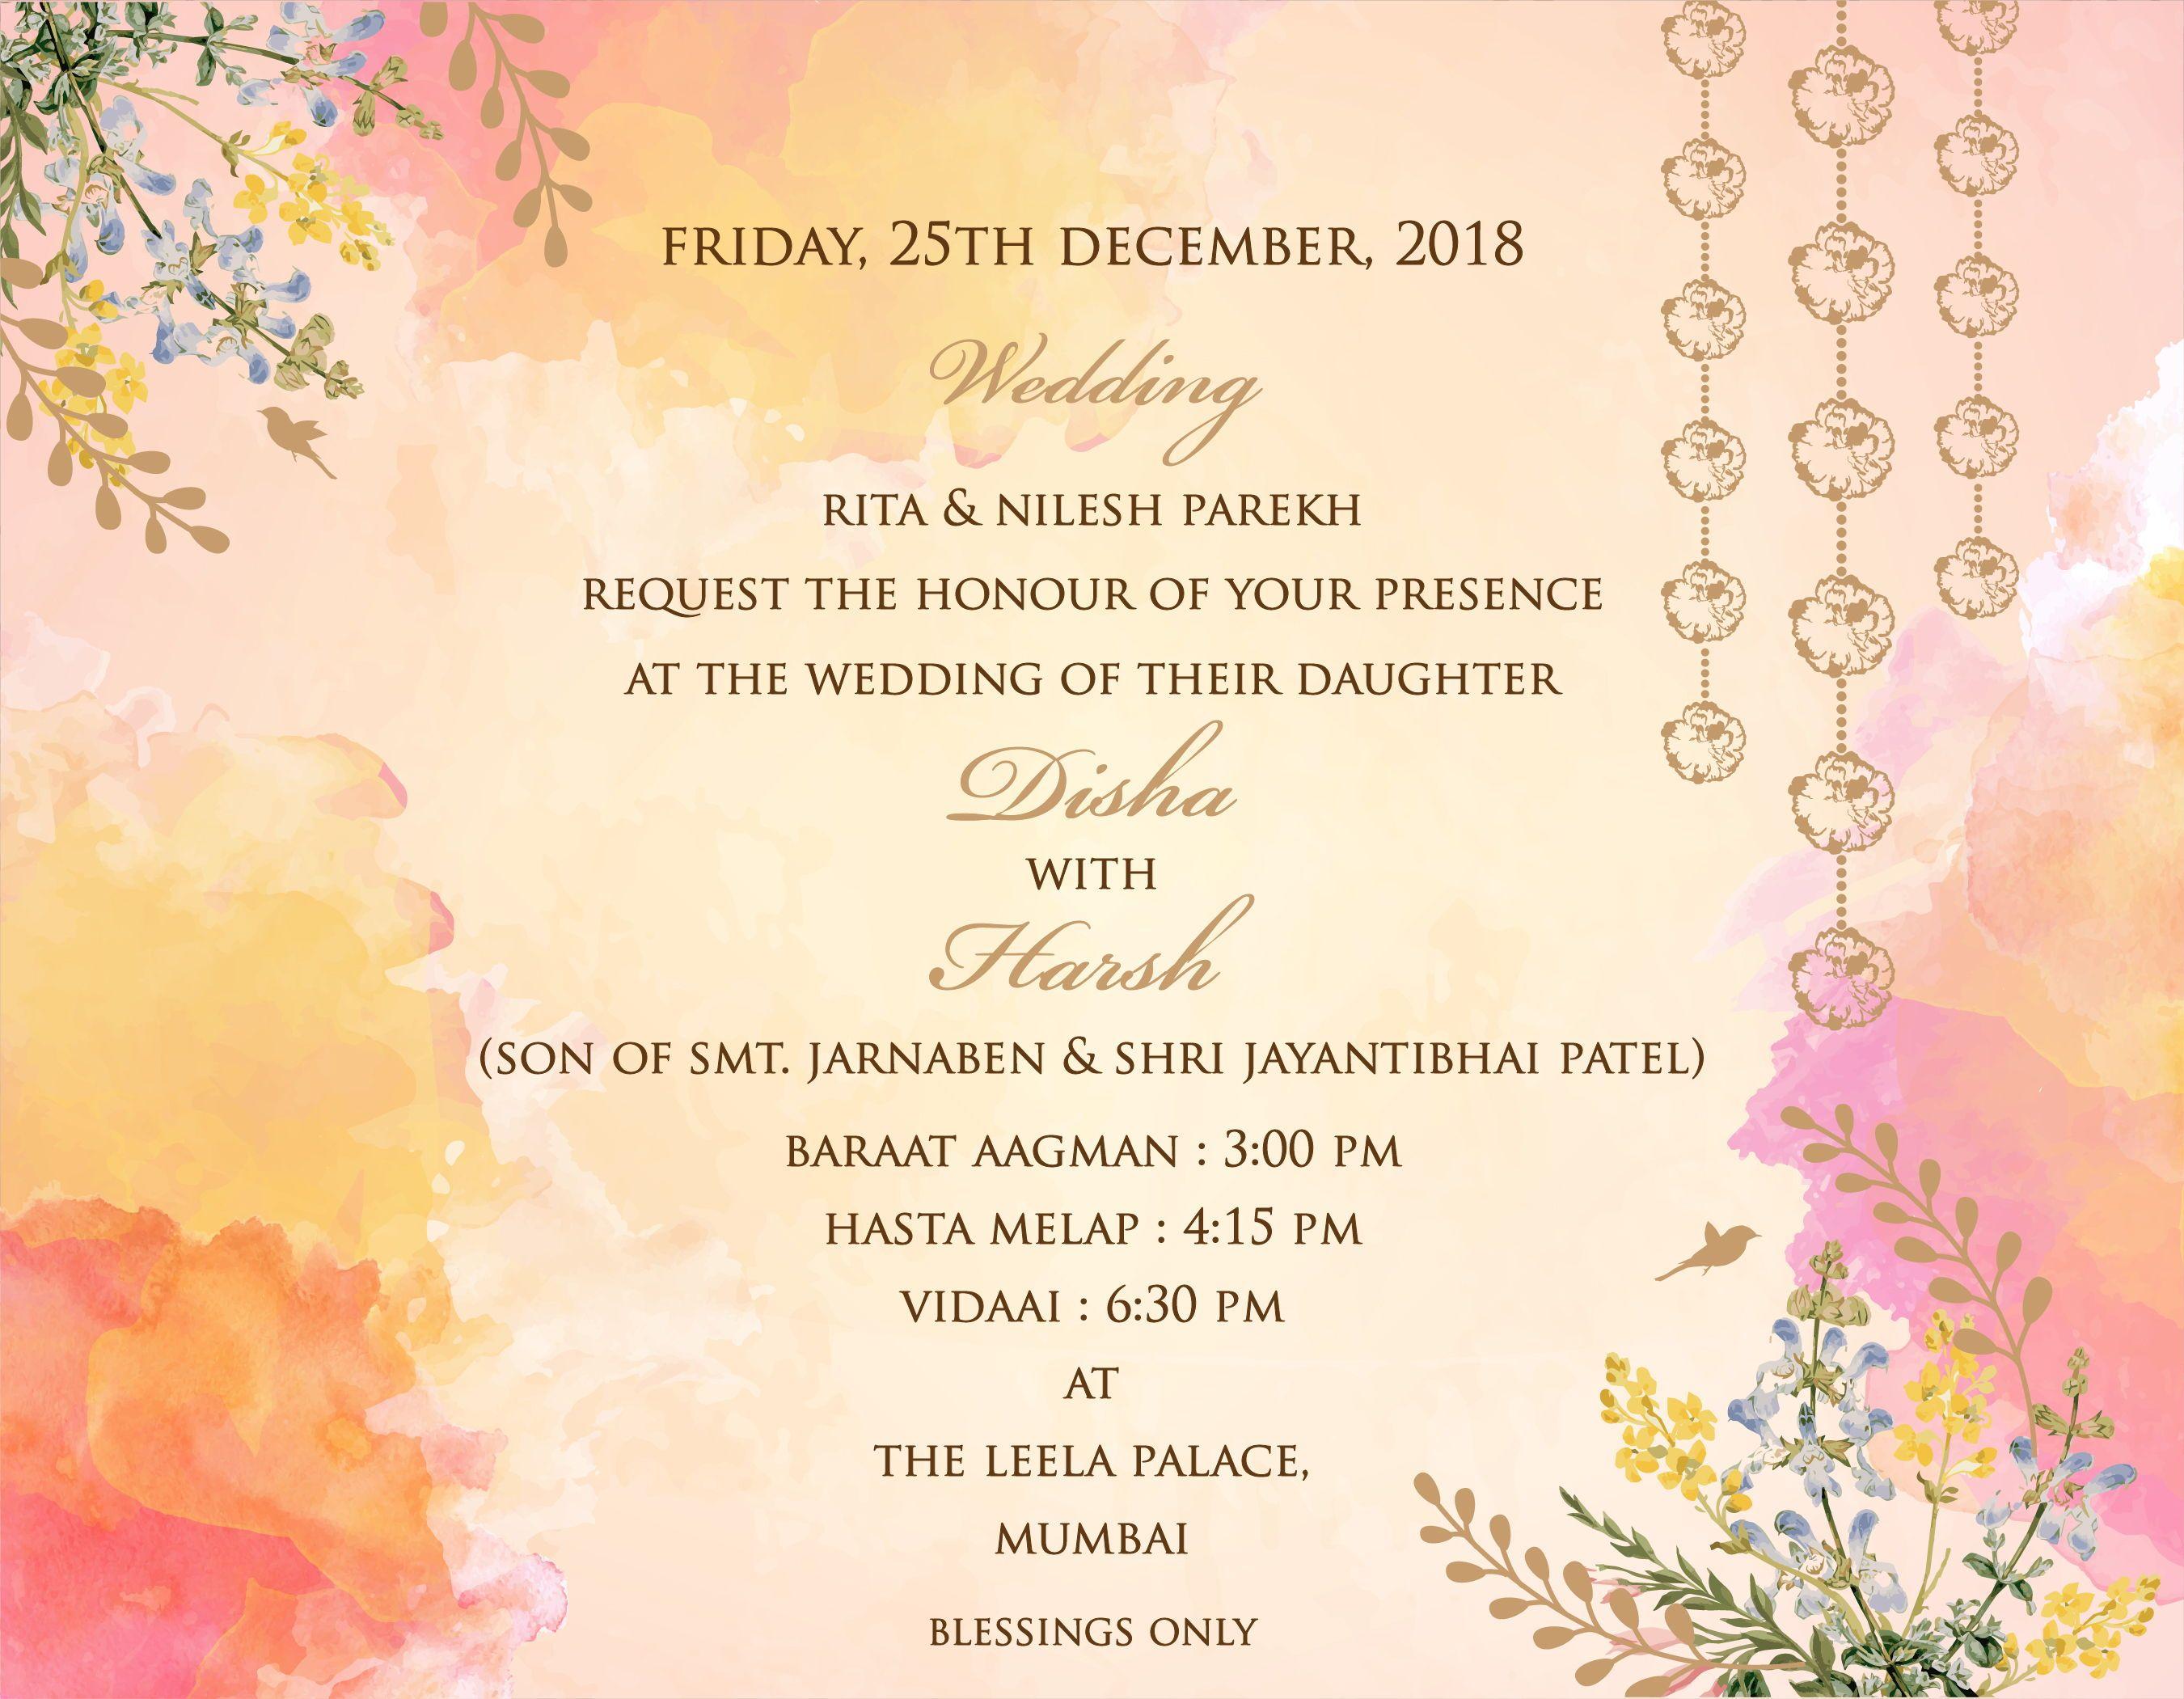 Wedding invitation cards, Indian wedding cards, invites, Wedding Sta… | Indian  wedding invitation cards, Wedding invitation cards, Indian wedding  invitation wording